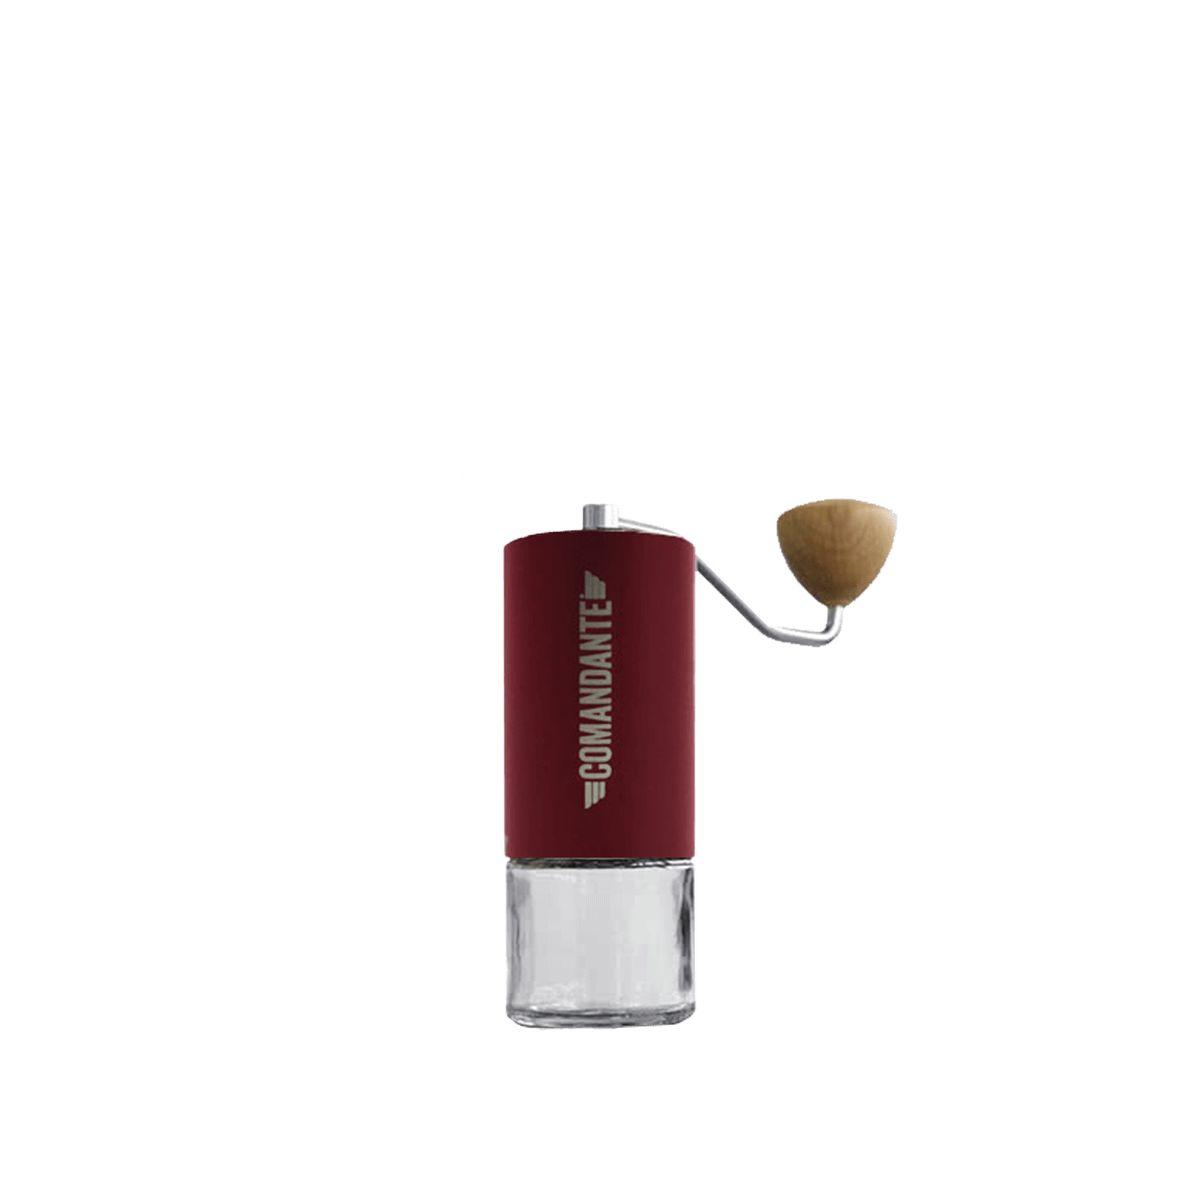 Coffee Grinder Comandante C40 [MK3] Nitro Blade - Burgundy